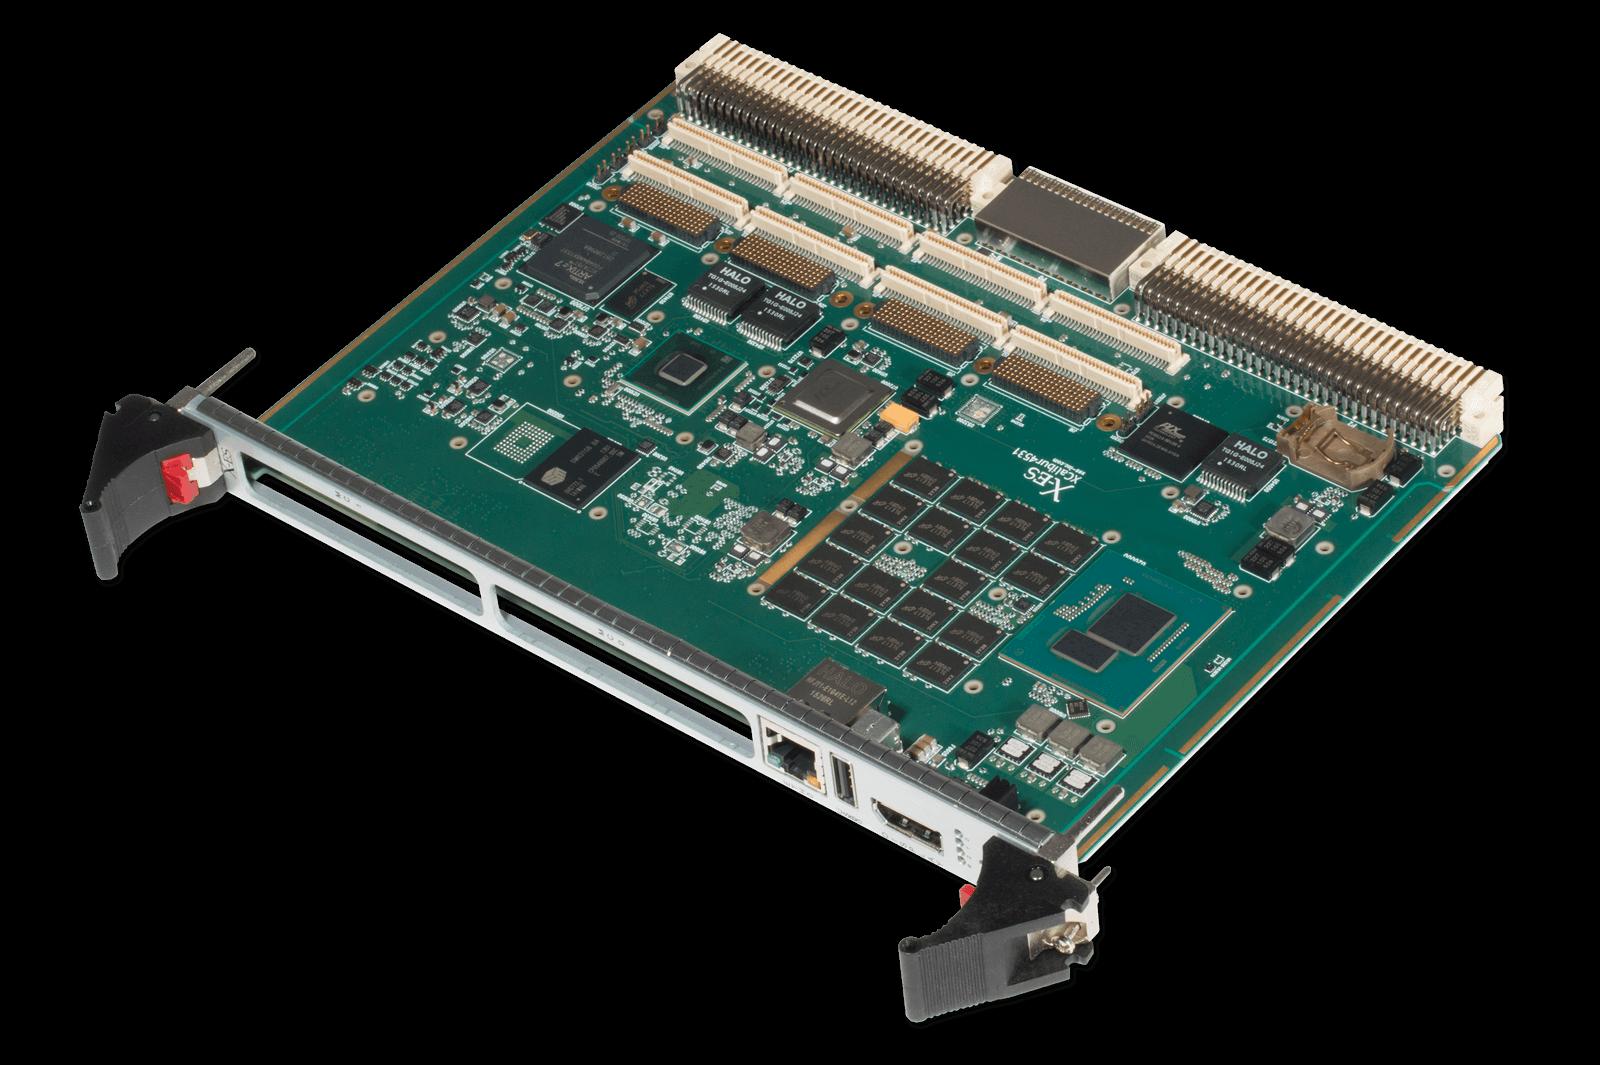 Xilinx Kintex UltraScale & Virtex-7 FPGA Technology